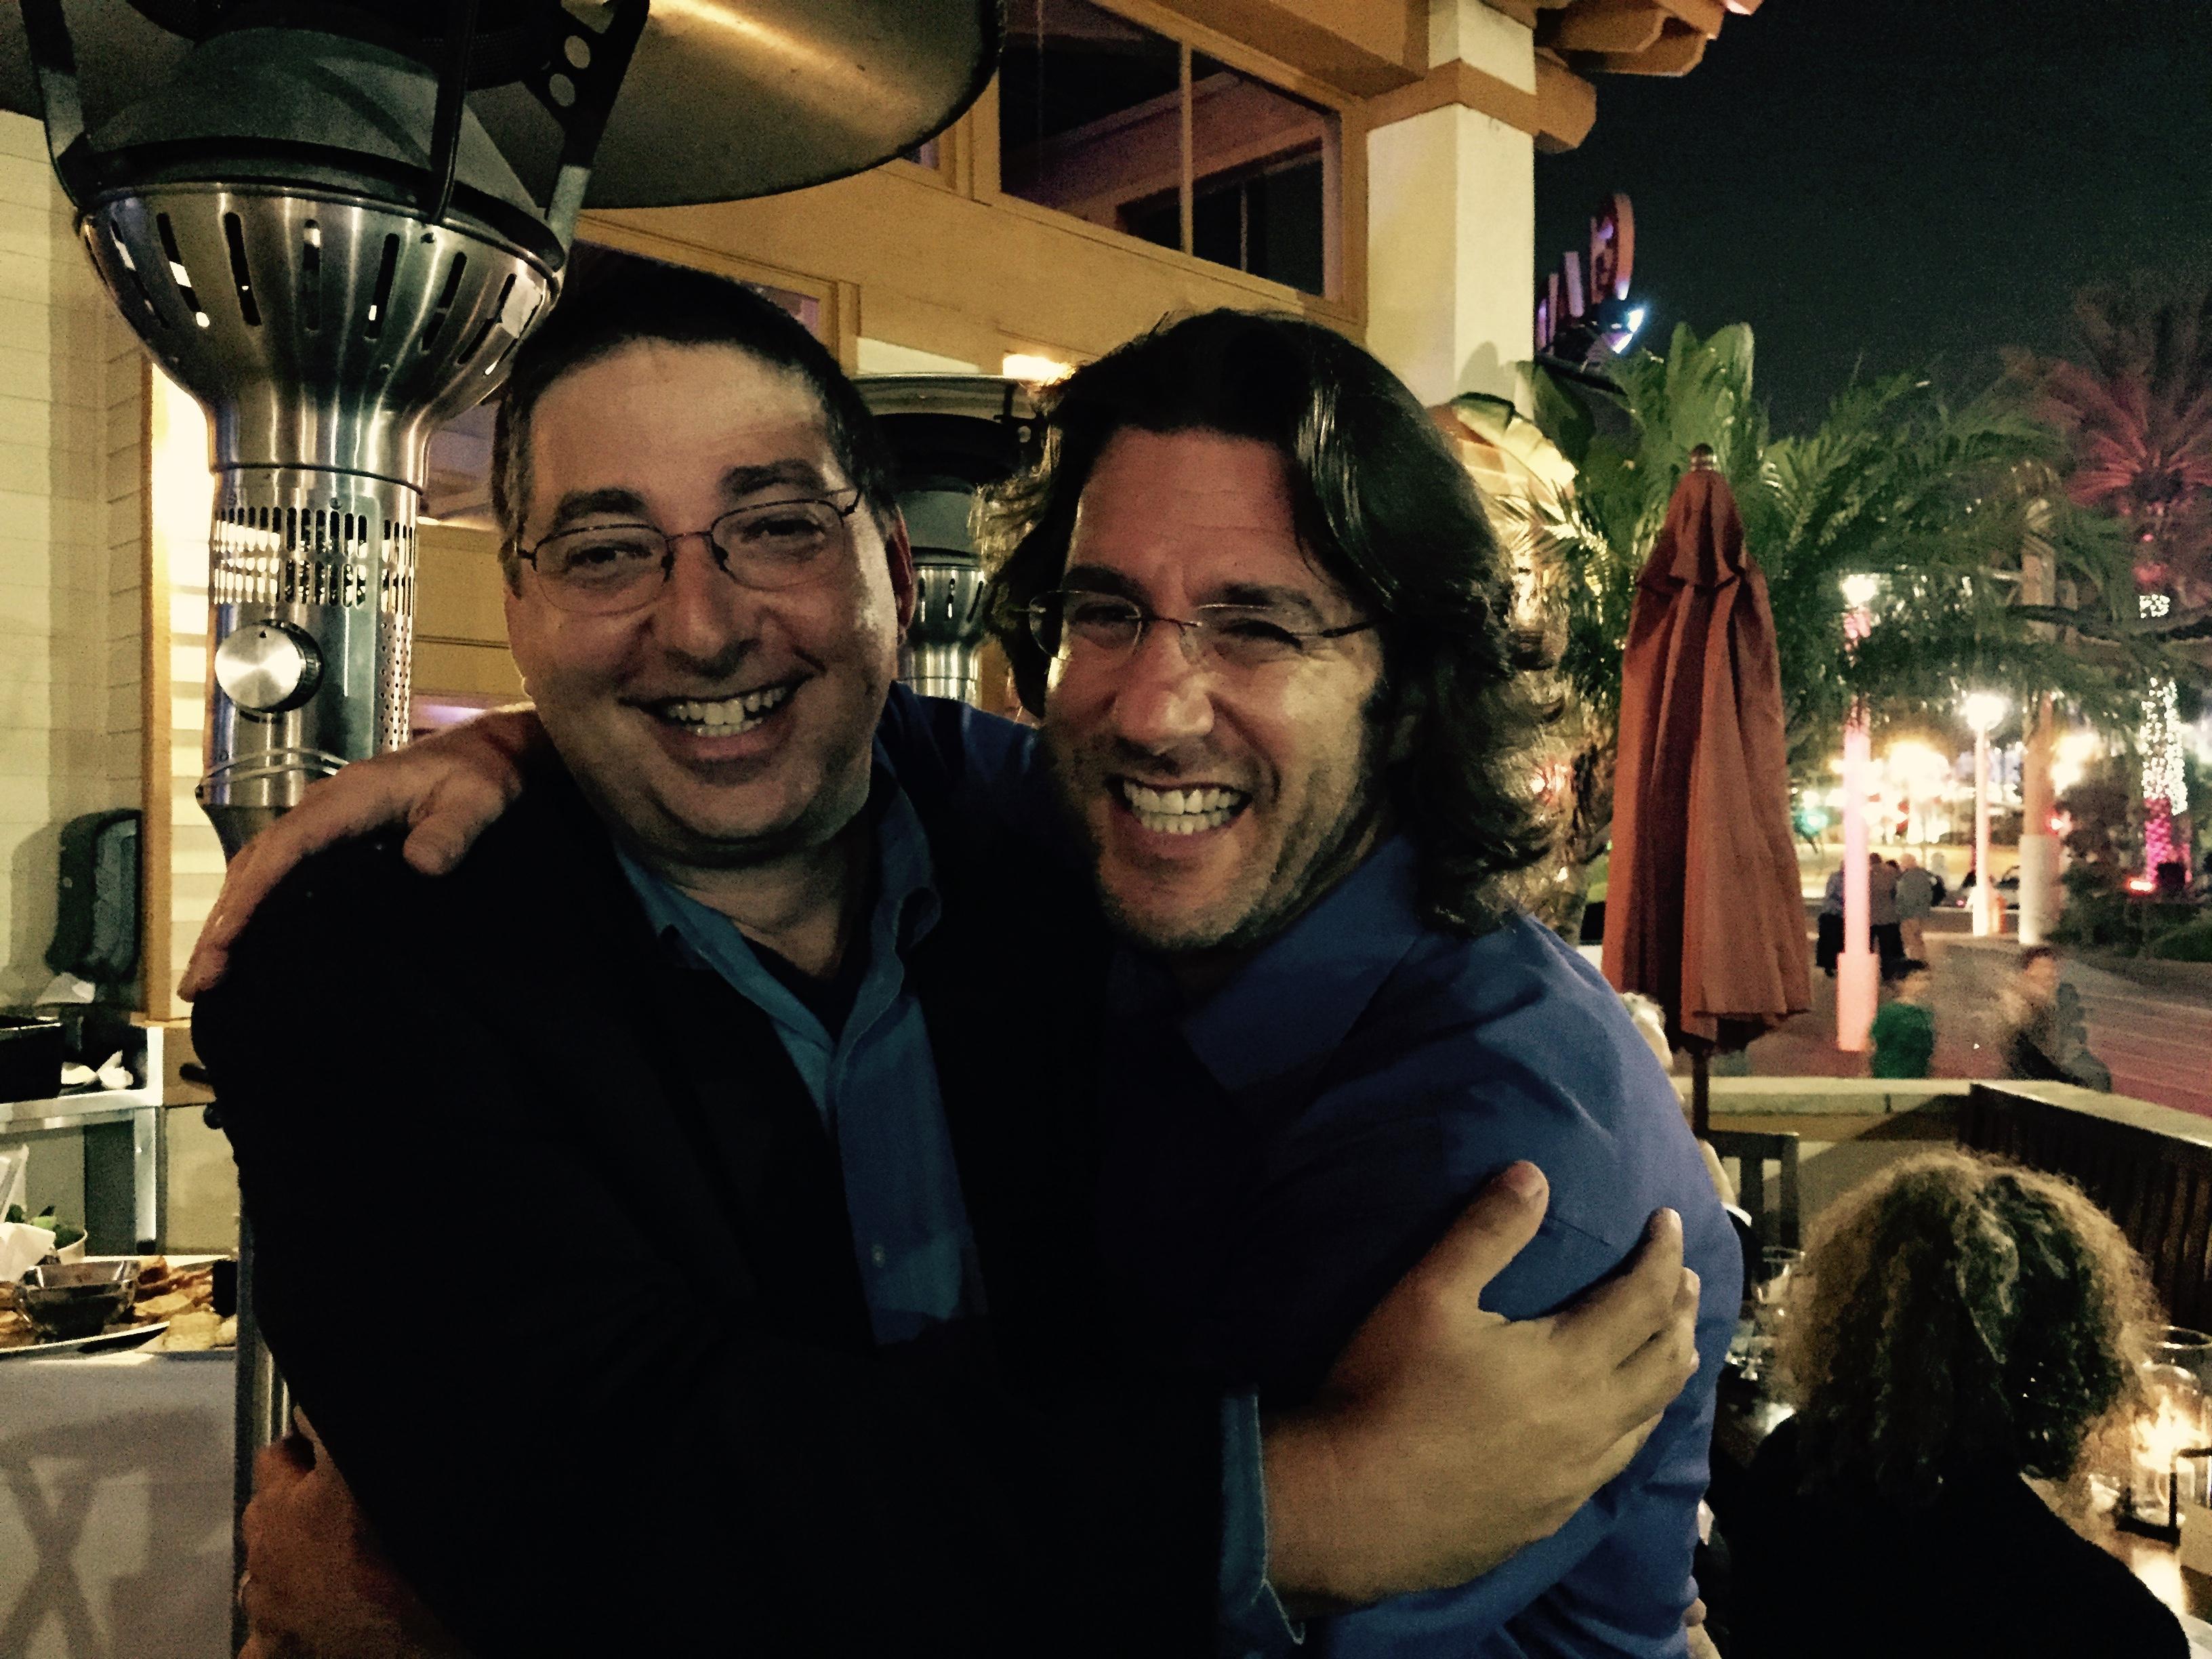 Lee Goldberg and Barry Eisler hug at Bouchercon 2014